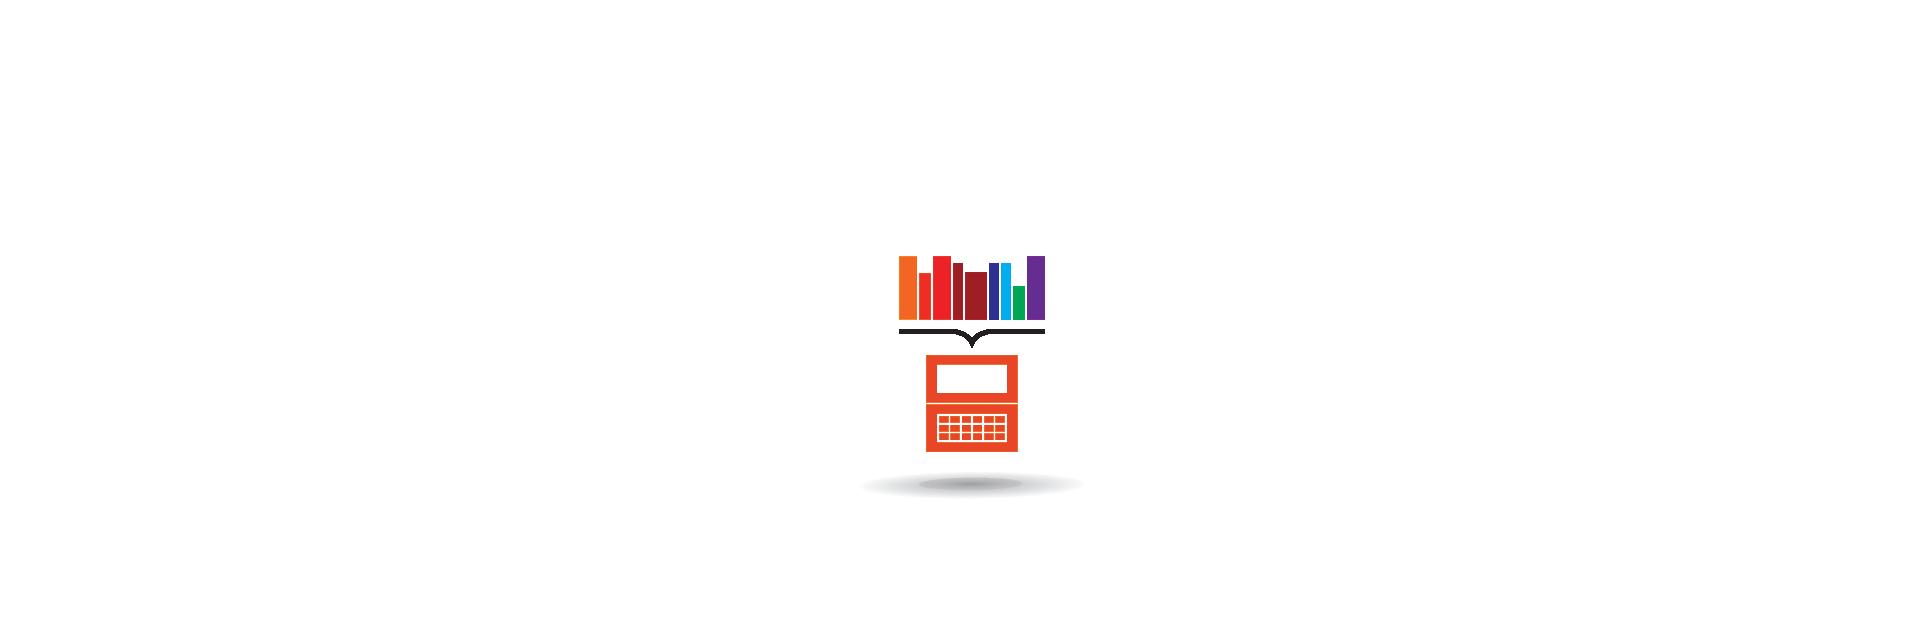 sale marketing kpi free ebook download